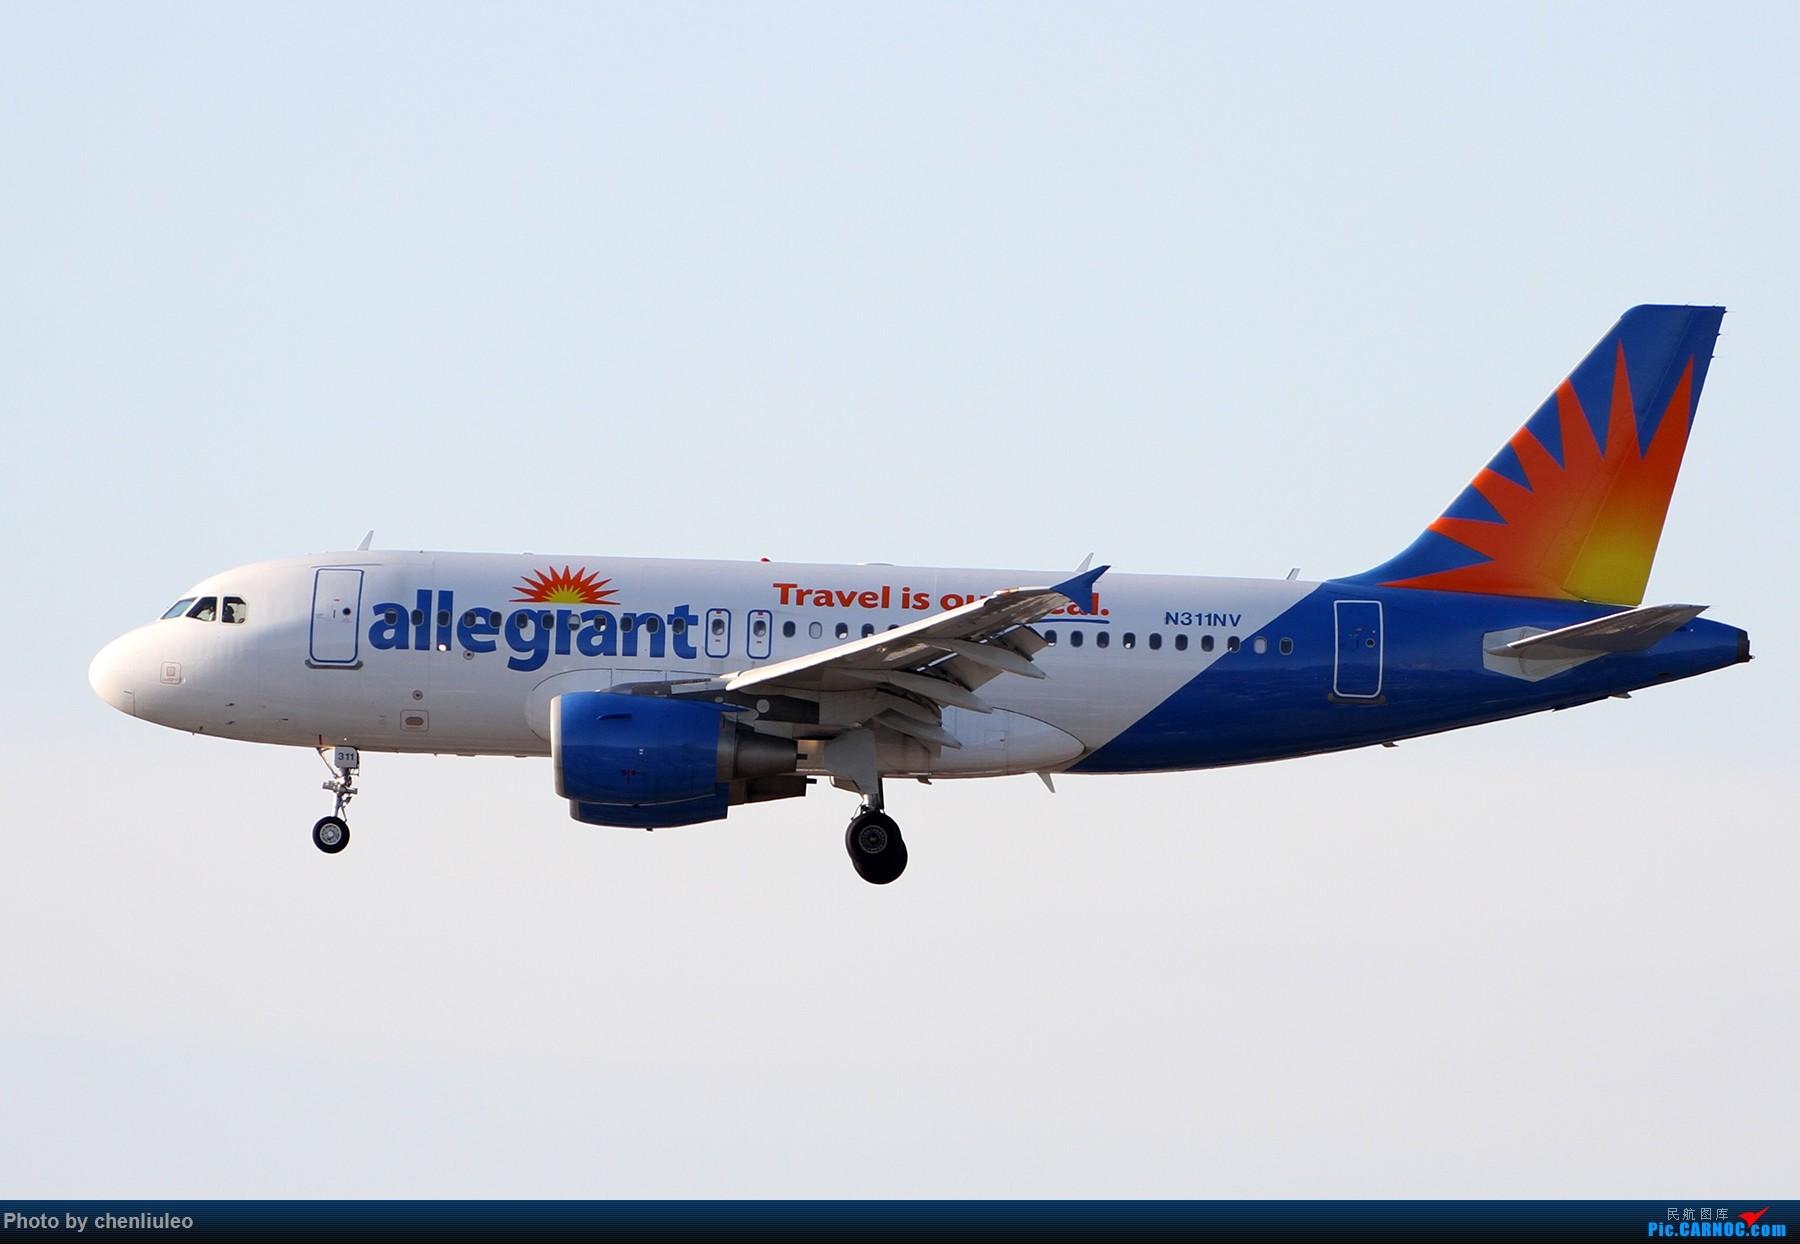 Re:[原创]【北美飞友会】洛杉矶世界机场黄昏随拍 AIRBUS A319-100 N311NV 美国洛杉矶机场